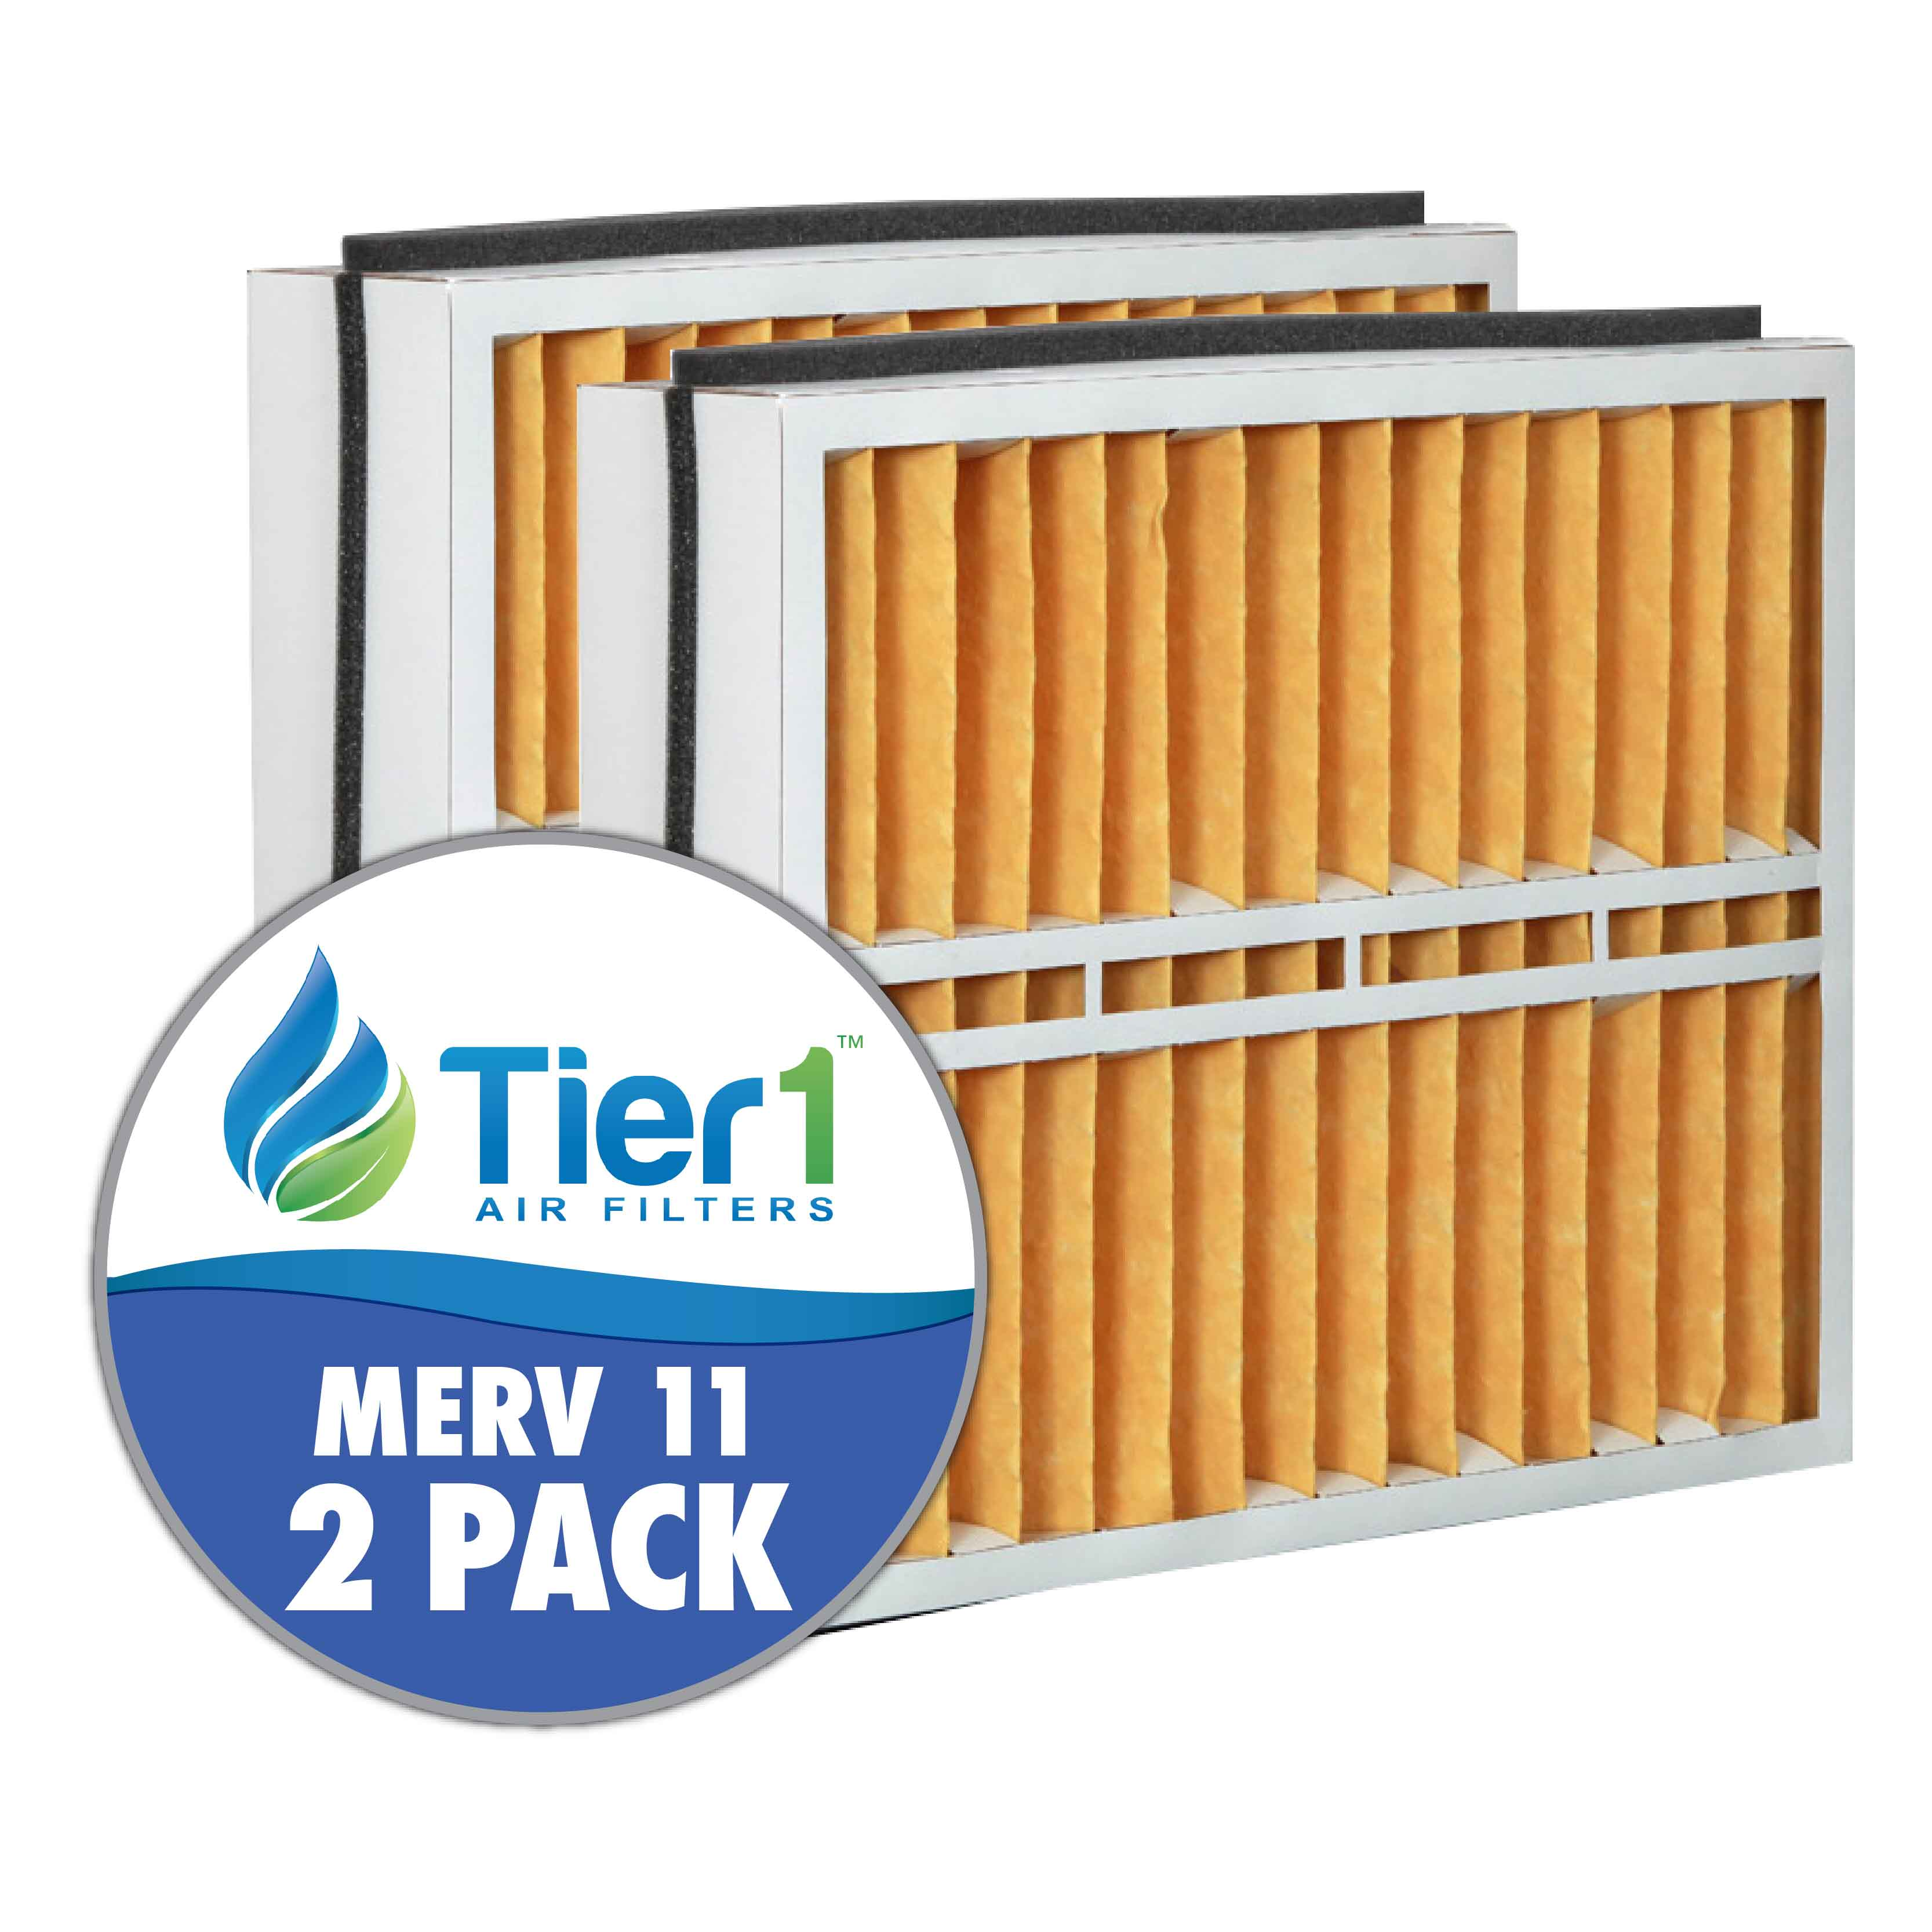 Trane 17.5x27x5 Merv 11 Replacement AC Furnace Air Filter (2 Pack)